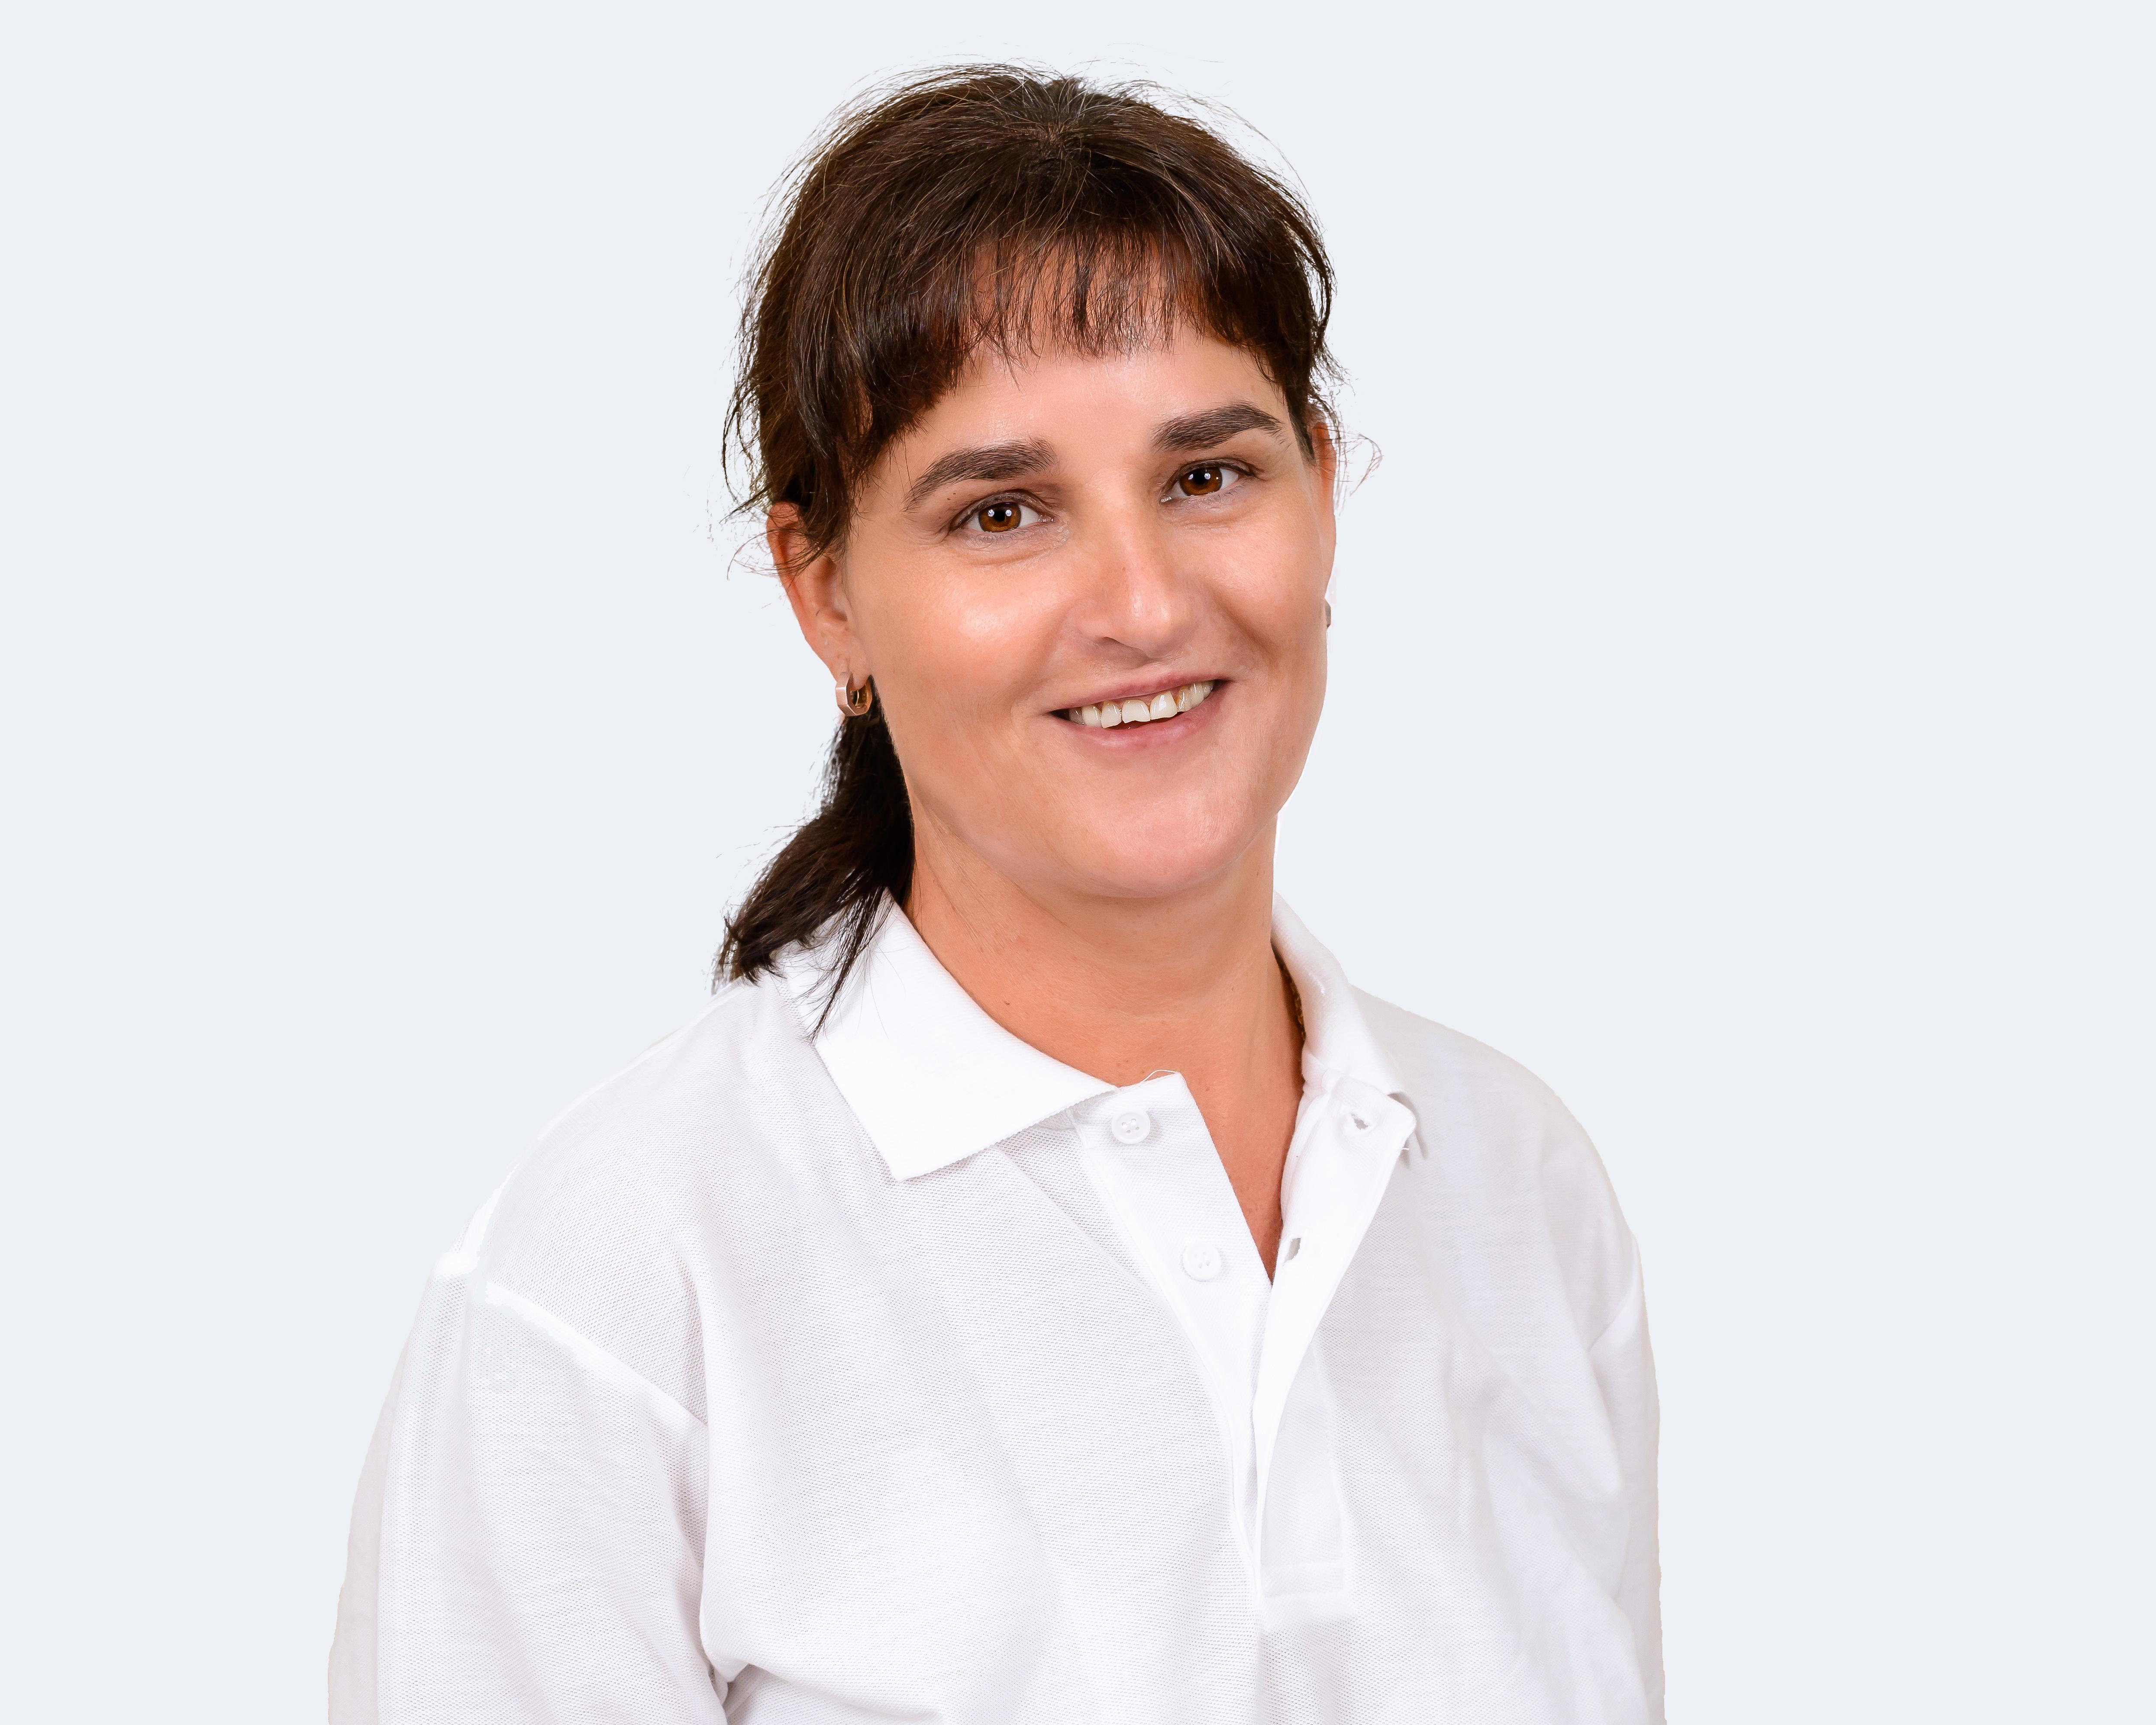 Kati Grohmann